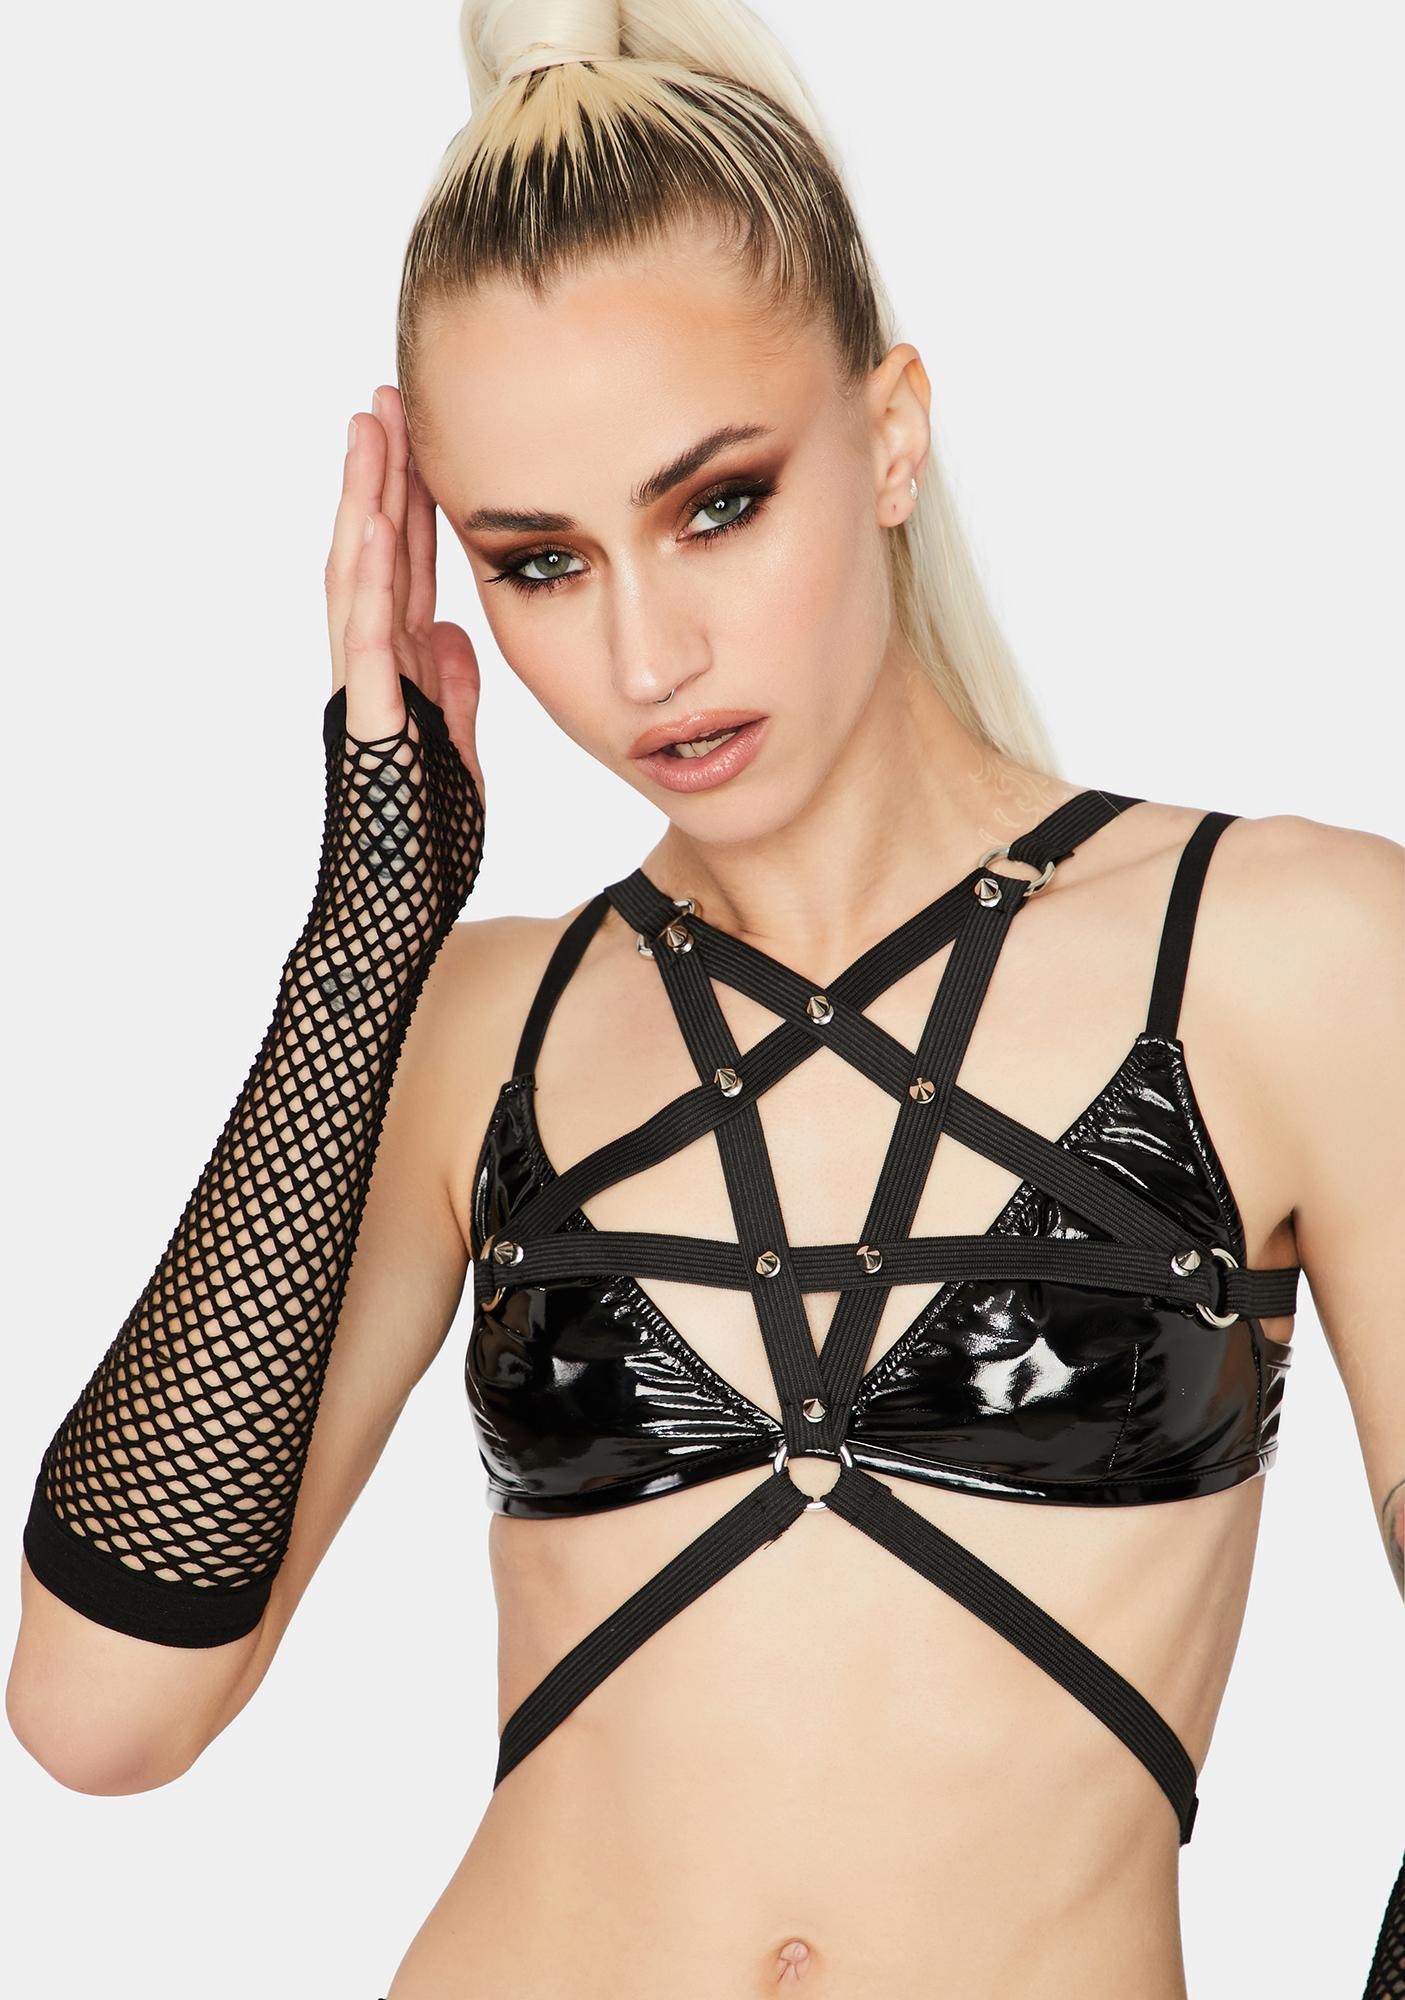 Pentagram Power Spiked Harness